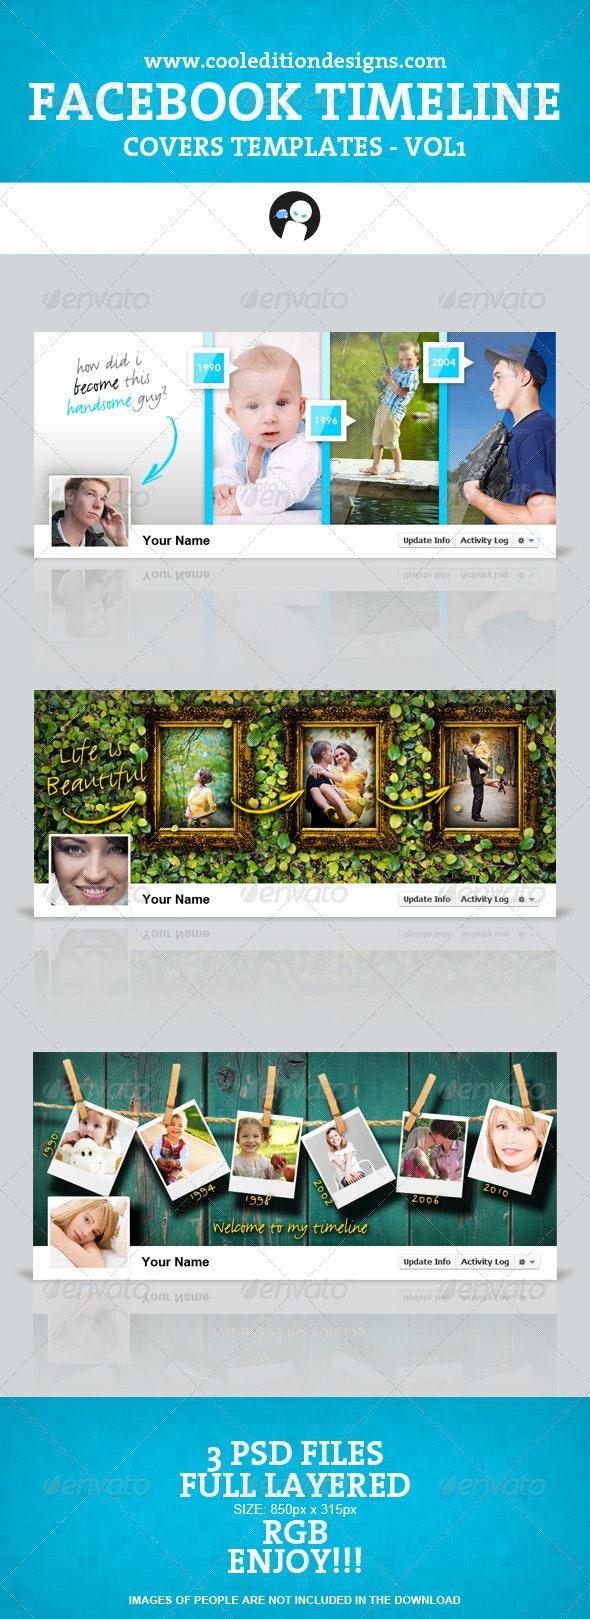 Facebook Timeline Covers Templates VOL1 - Facebook Timeline Covers Social Media